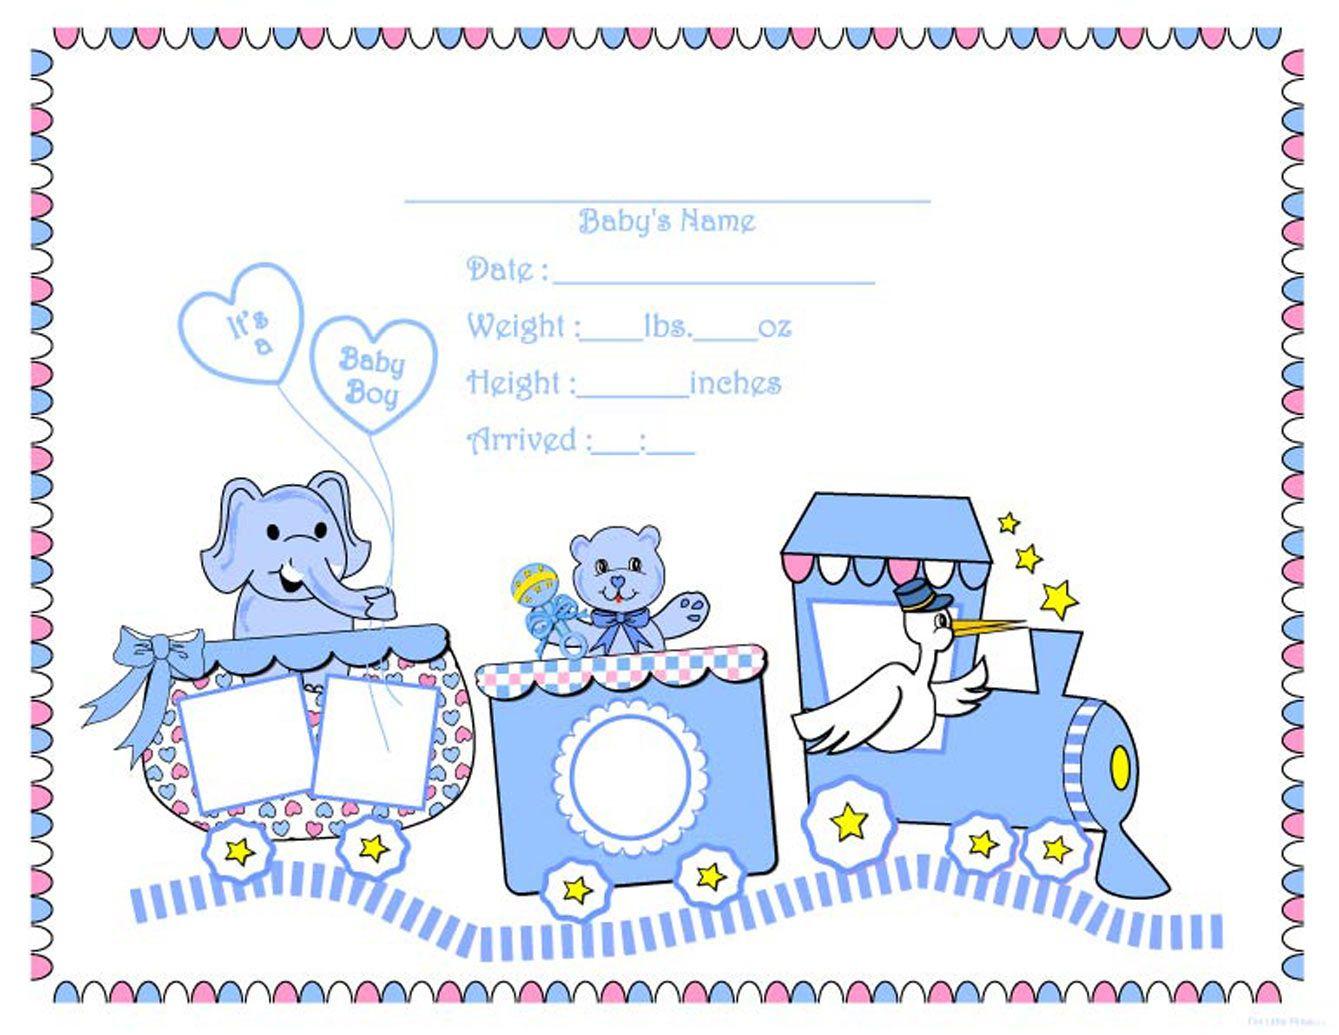 25 Best Image Of Scrapbook Printables Templates | Scrapbook Diy - Baby Scrapbook Templates Free Printable